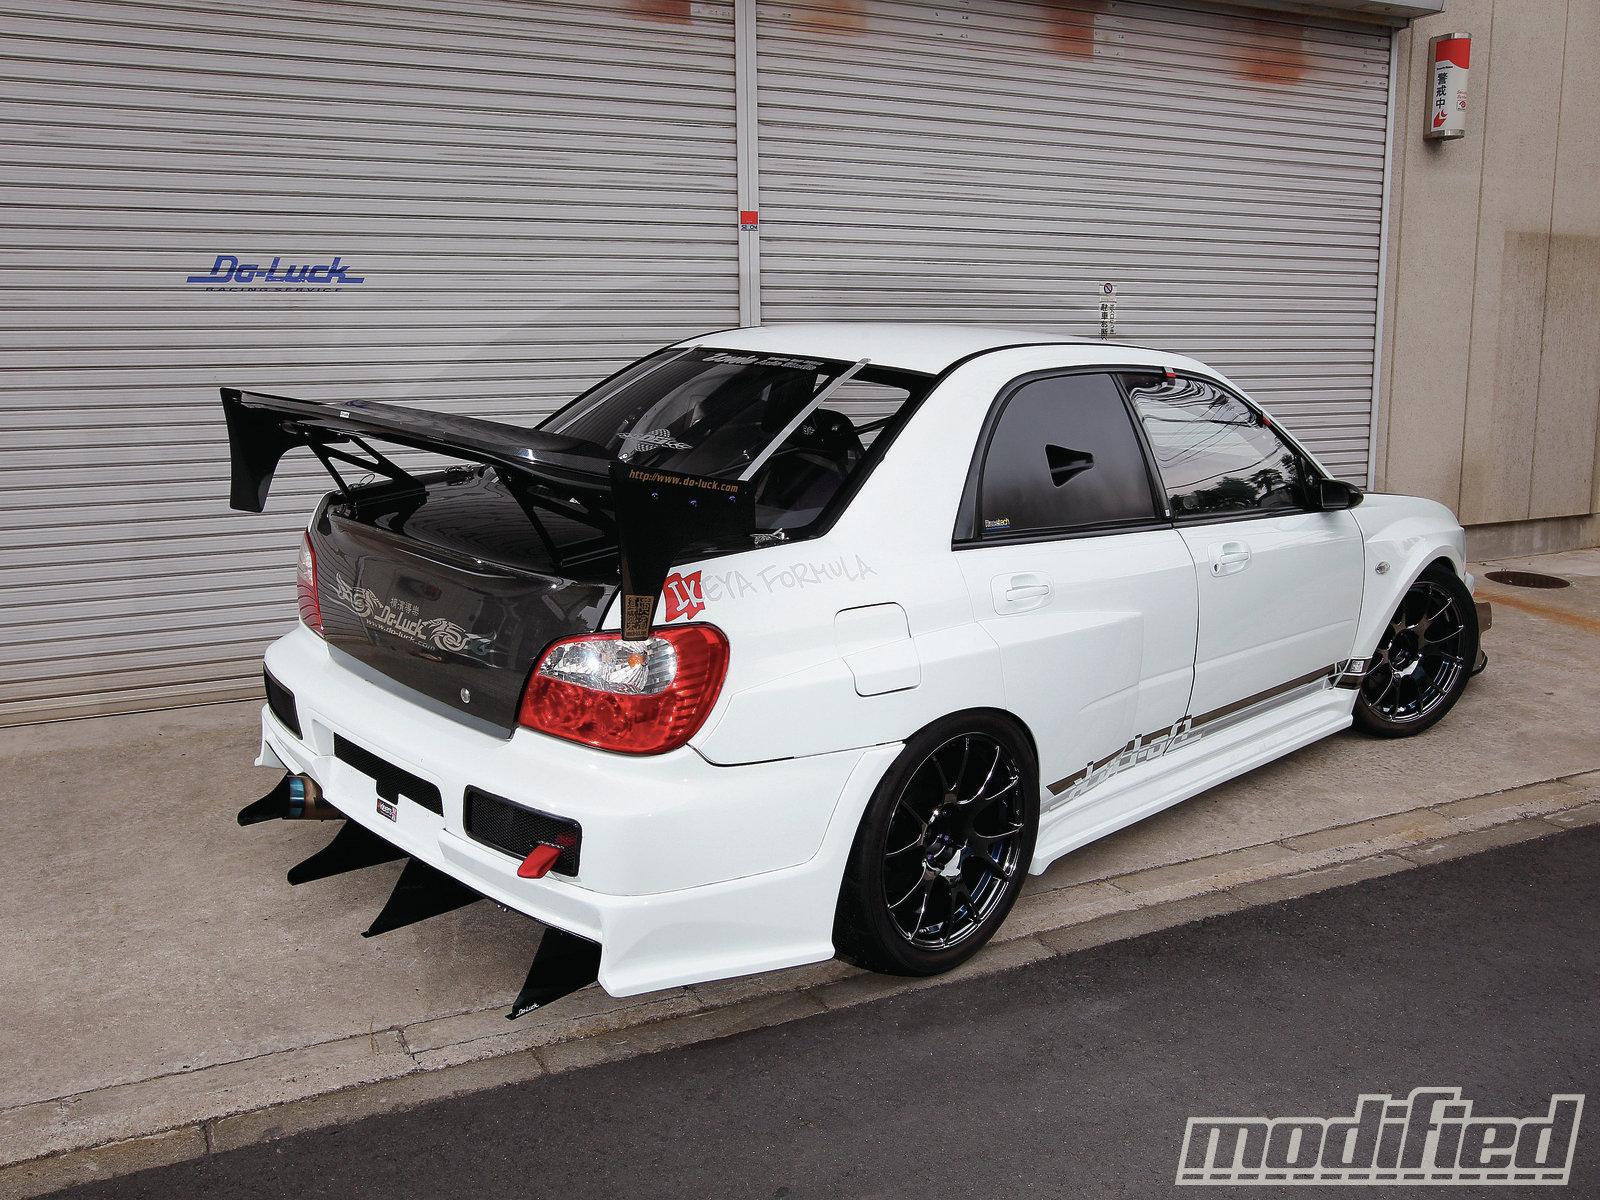 2002 Subaru Impreza Wrx Modified Magazine